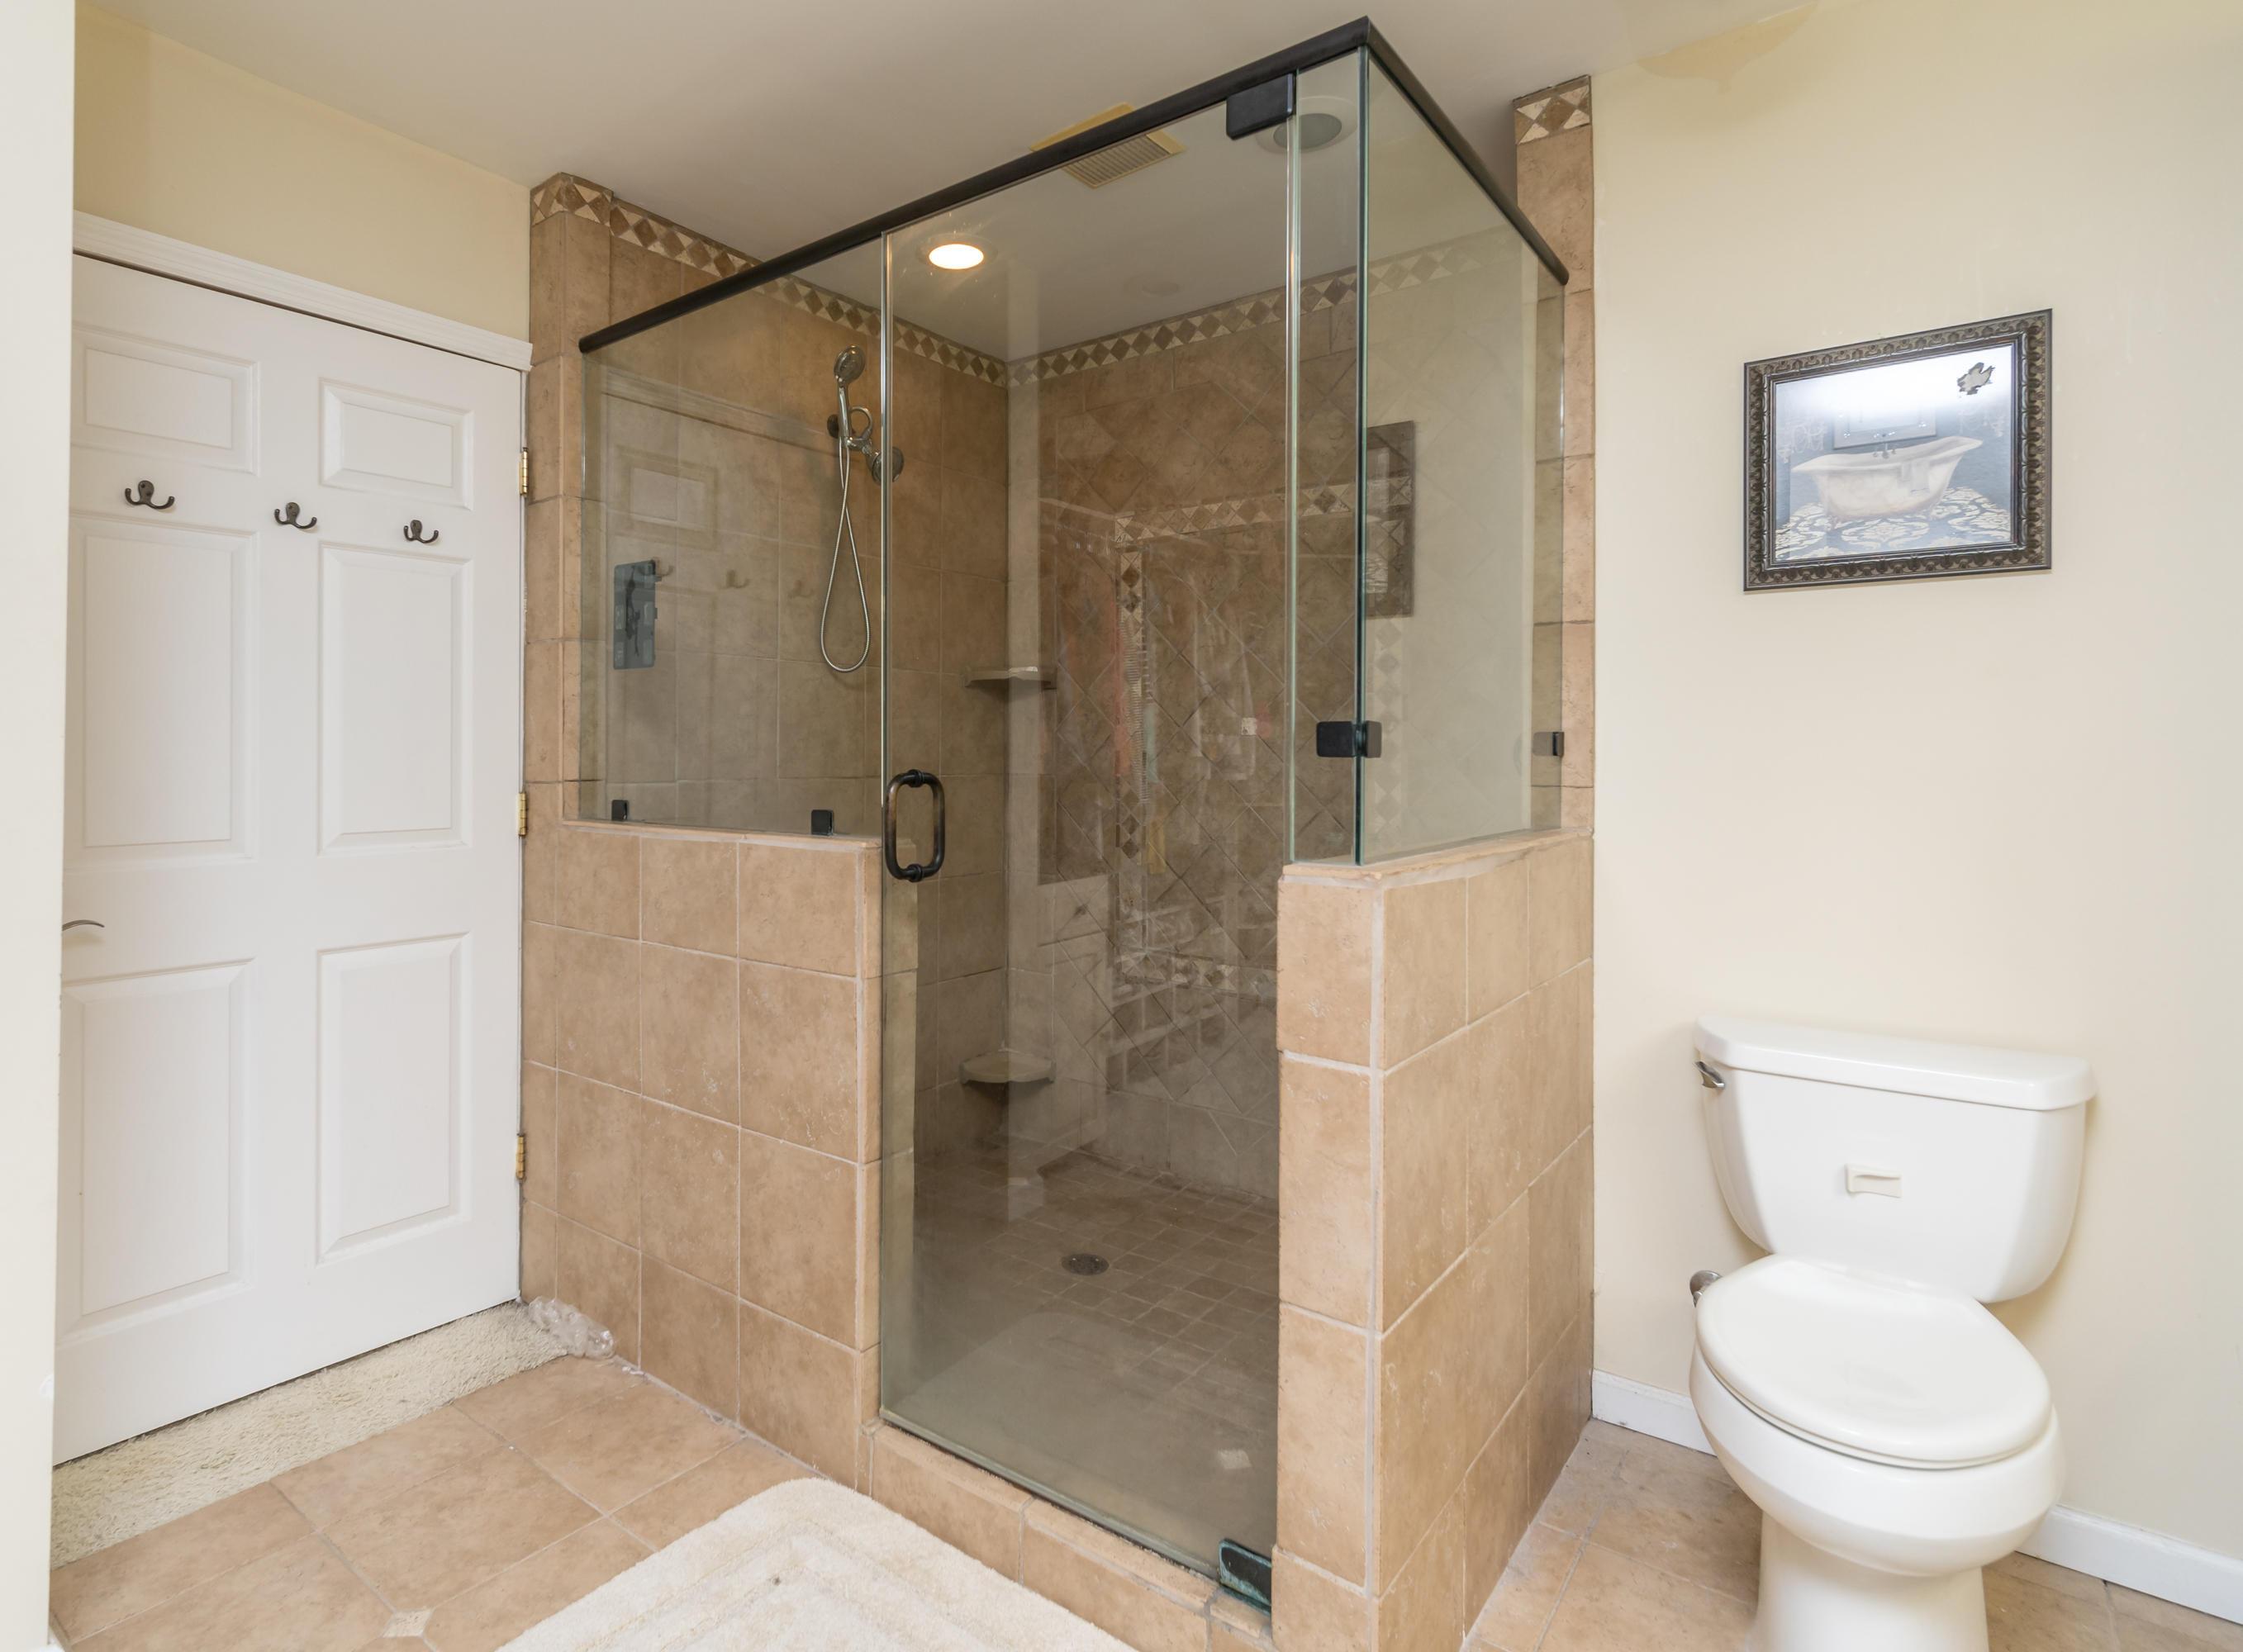 Northwoods Estates Homes For Sale - 8128 Sardis, North Charleston, SC - 26